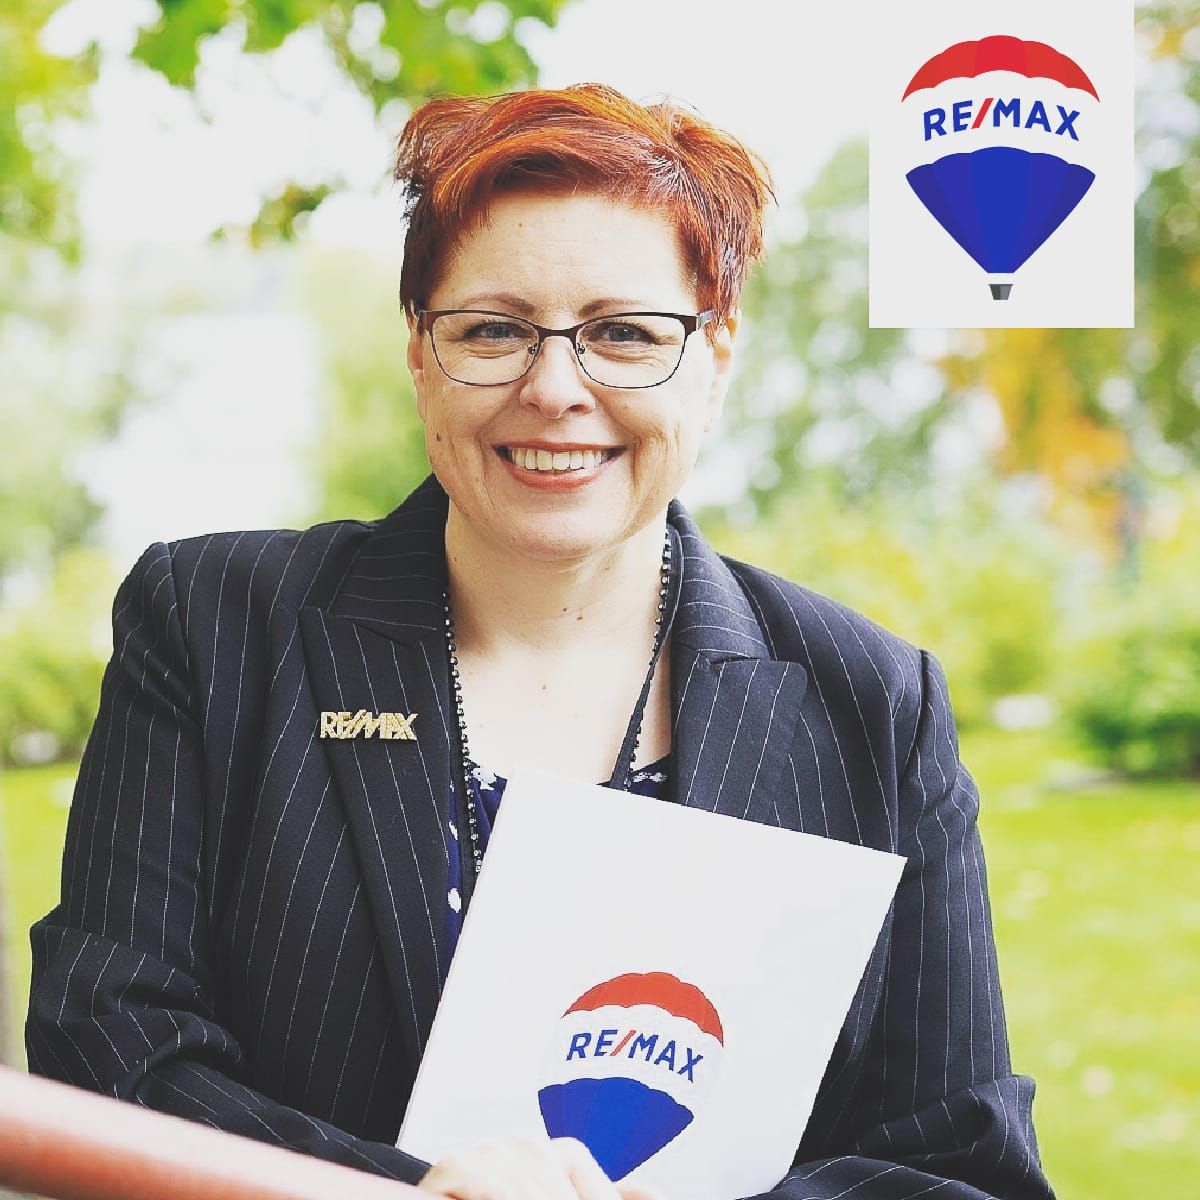 Johanna Kinnunen